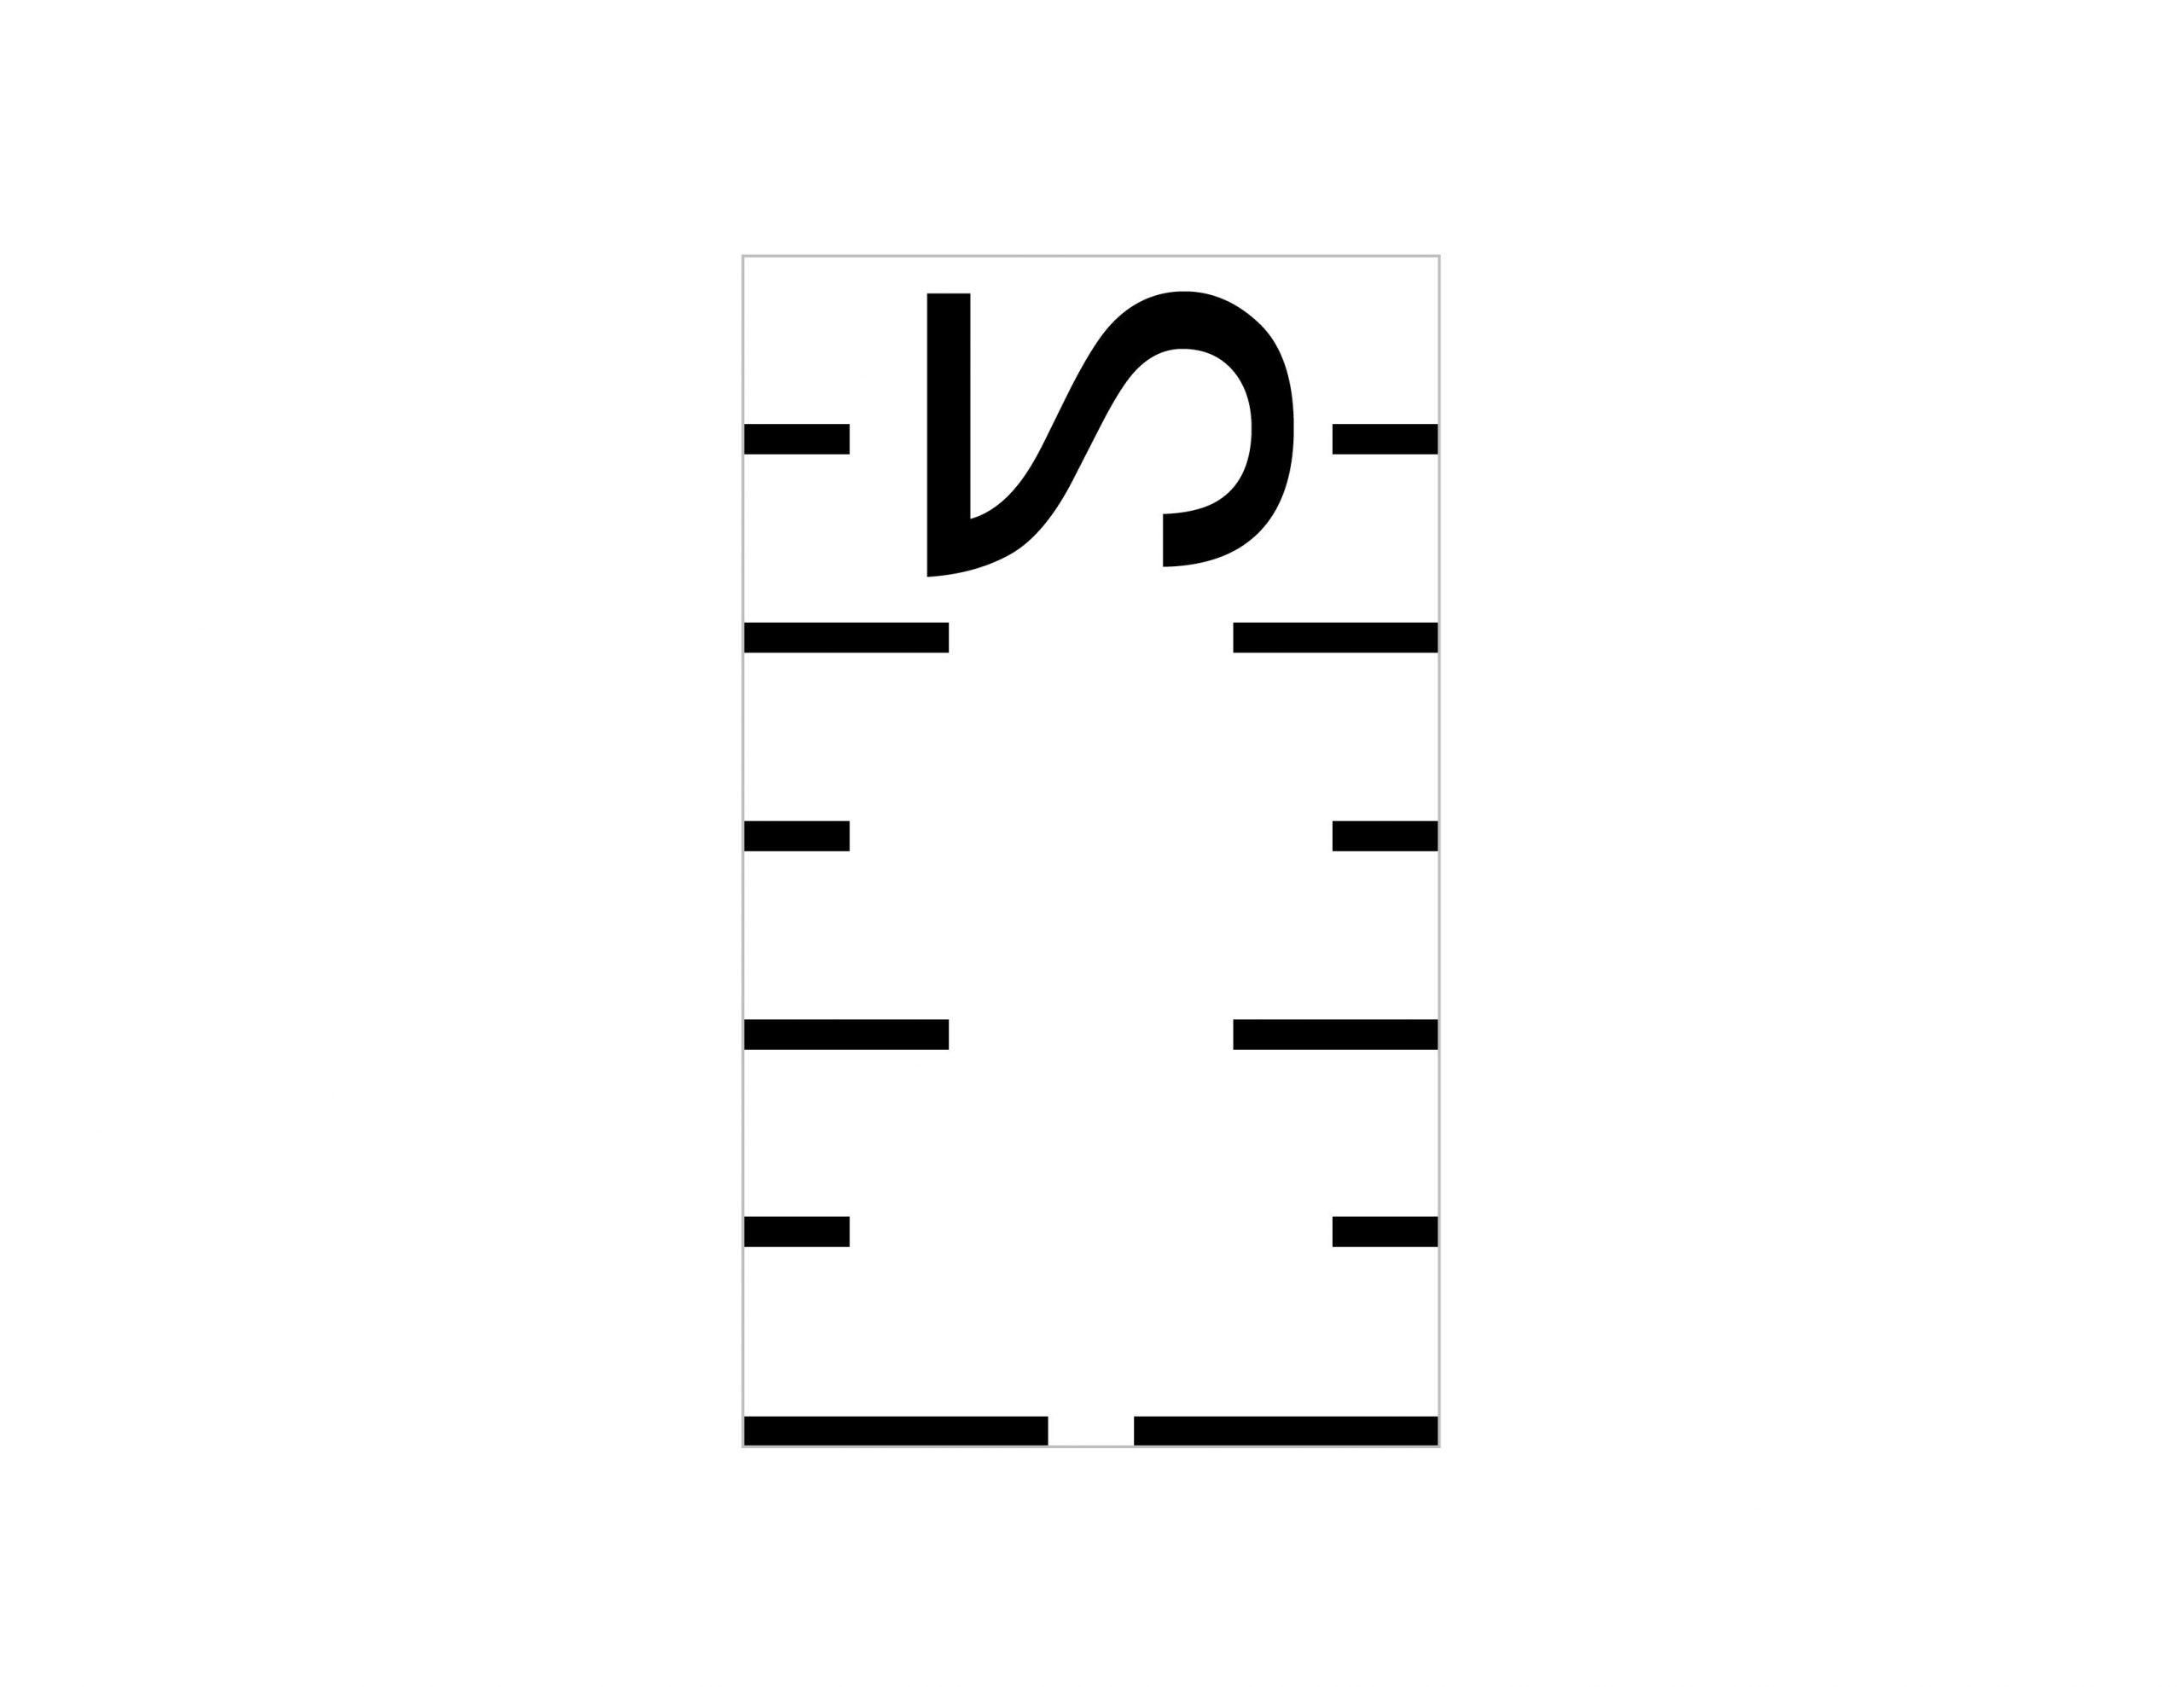 Easy Diy Ruler Growth Chart | Growth Chart Ruler, Growth